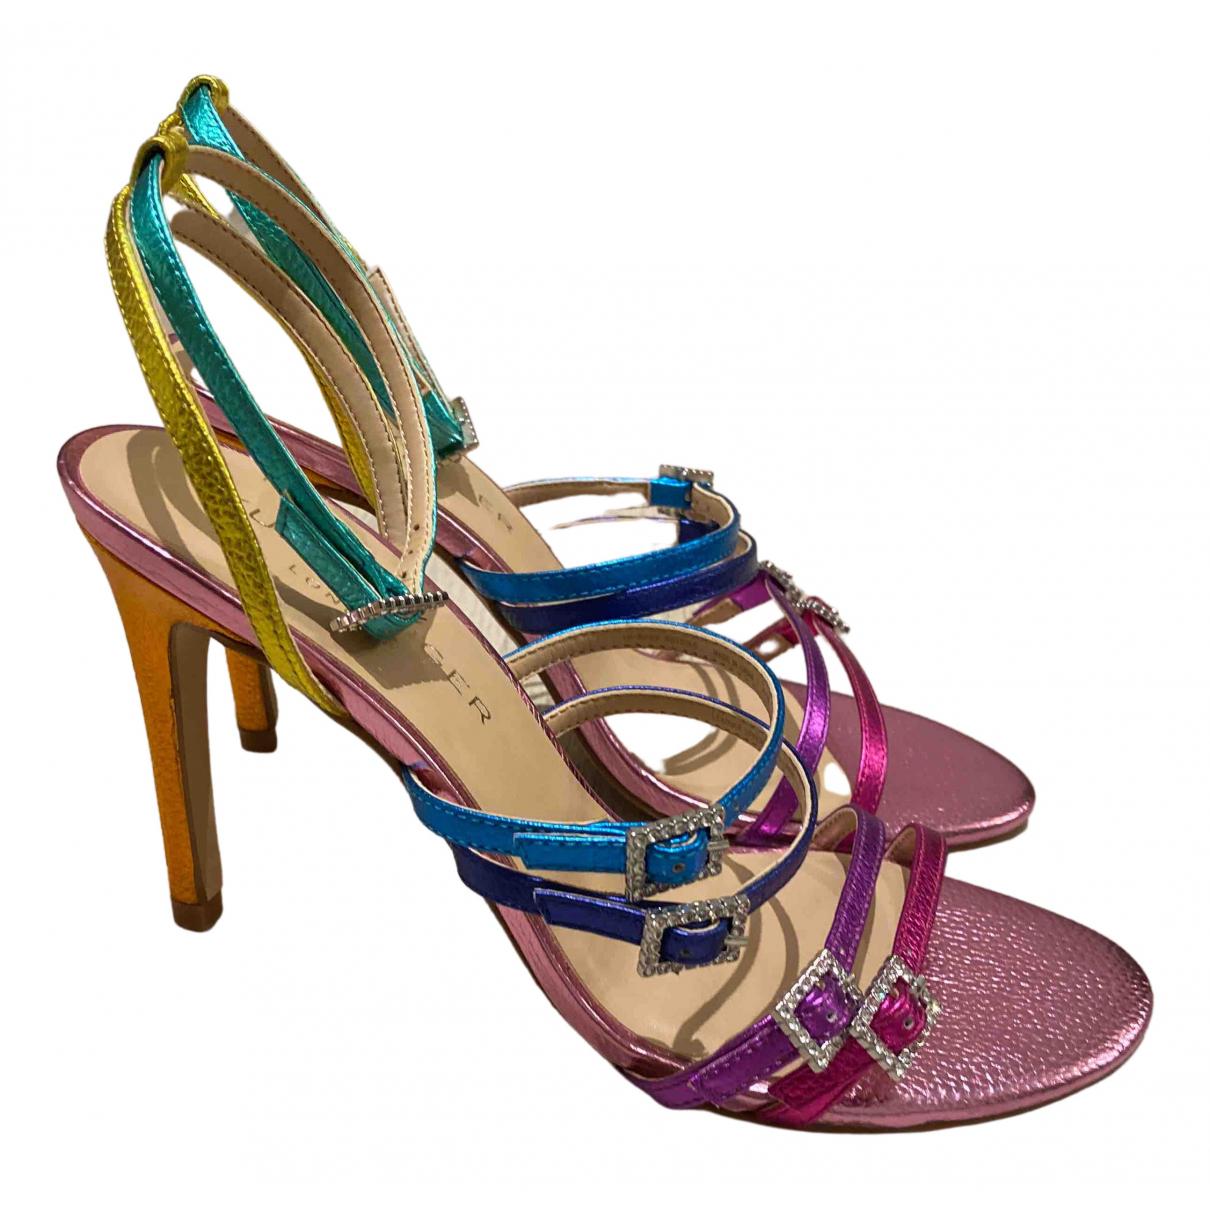 Kurt Geiger \N Multicolour Leather Sandals for Women 39 EU